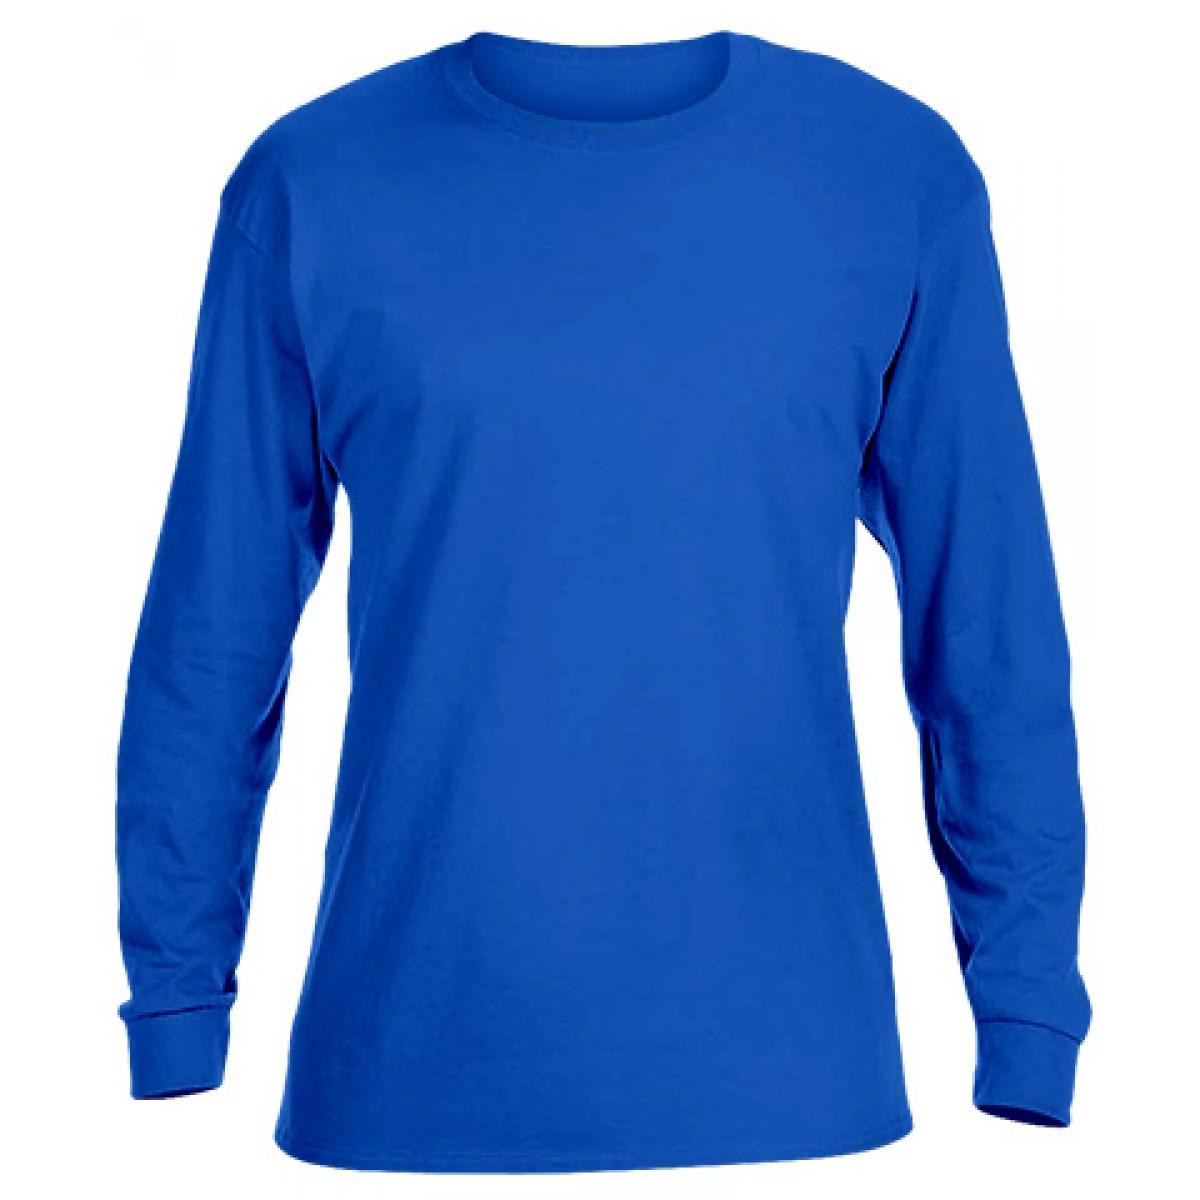 Basic Long Sleeve Crew Neck -Royal Blue-YM